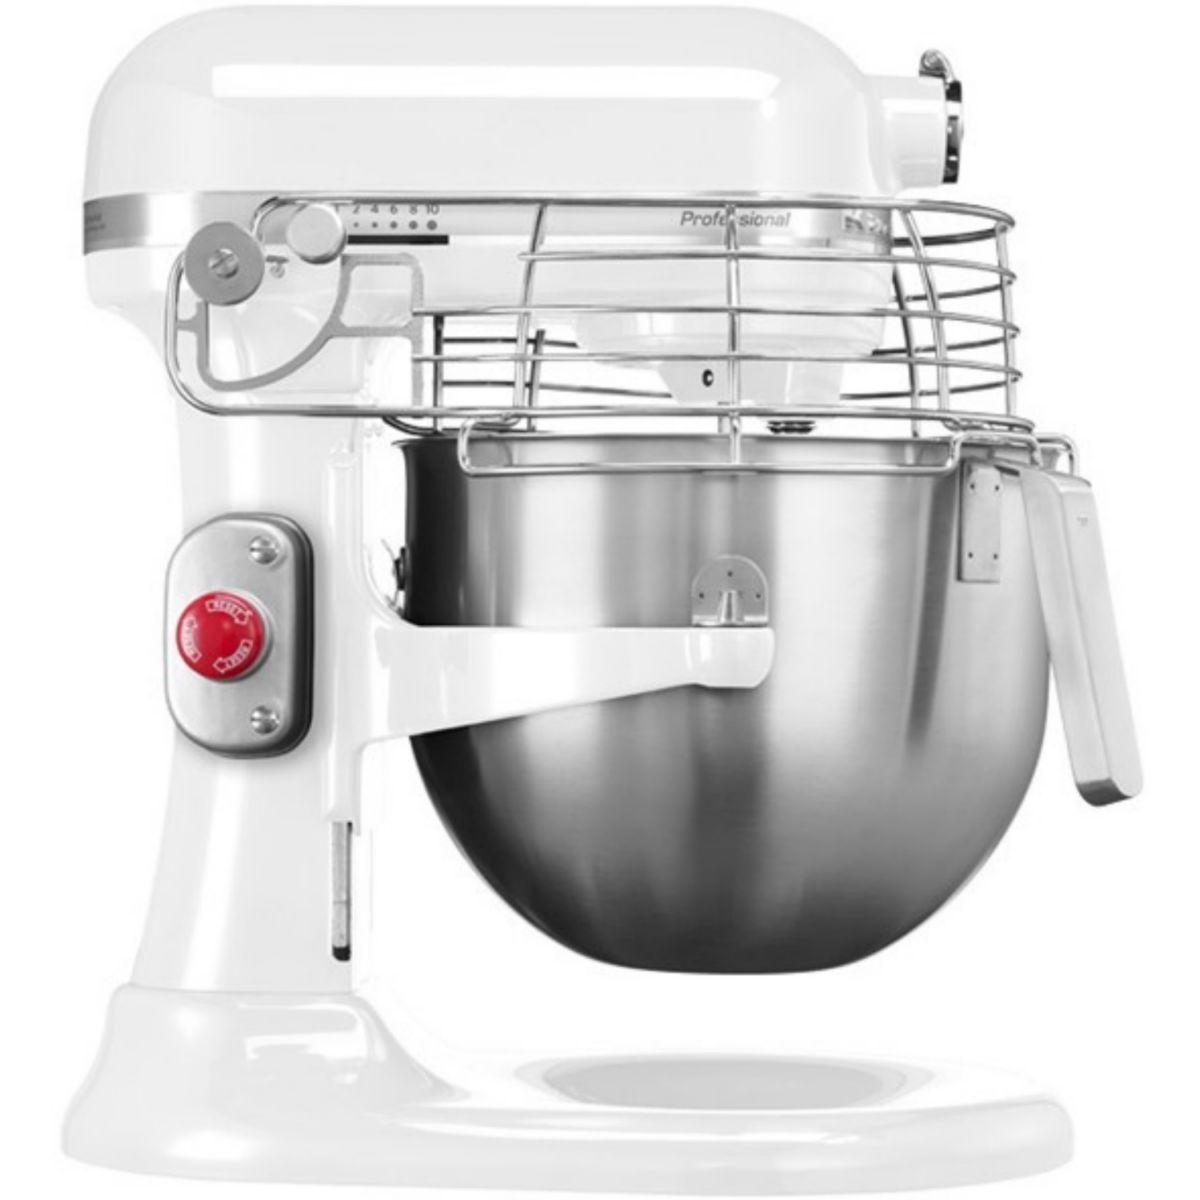 Kuchyňský robot Professional, 6,9 l barva bílá